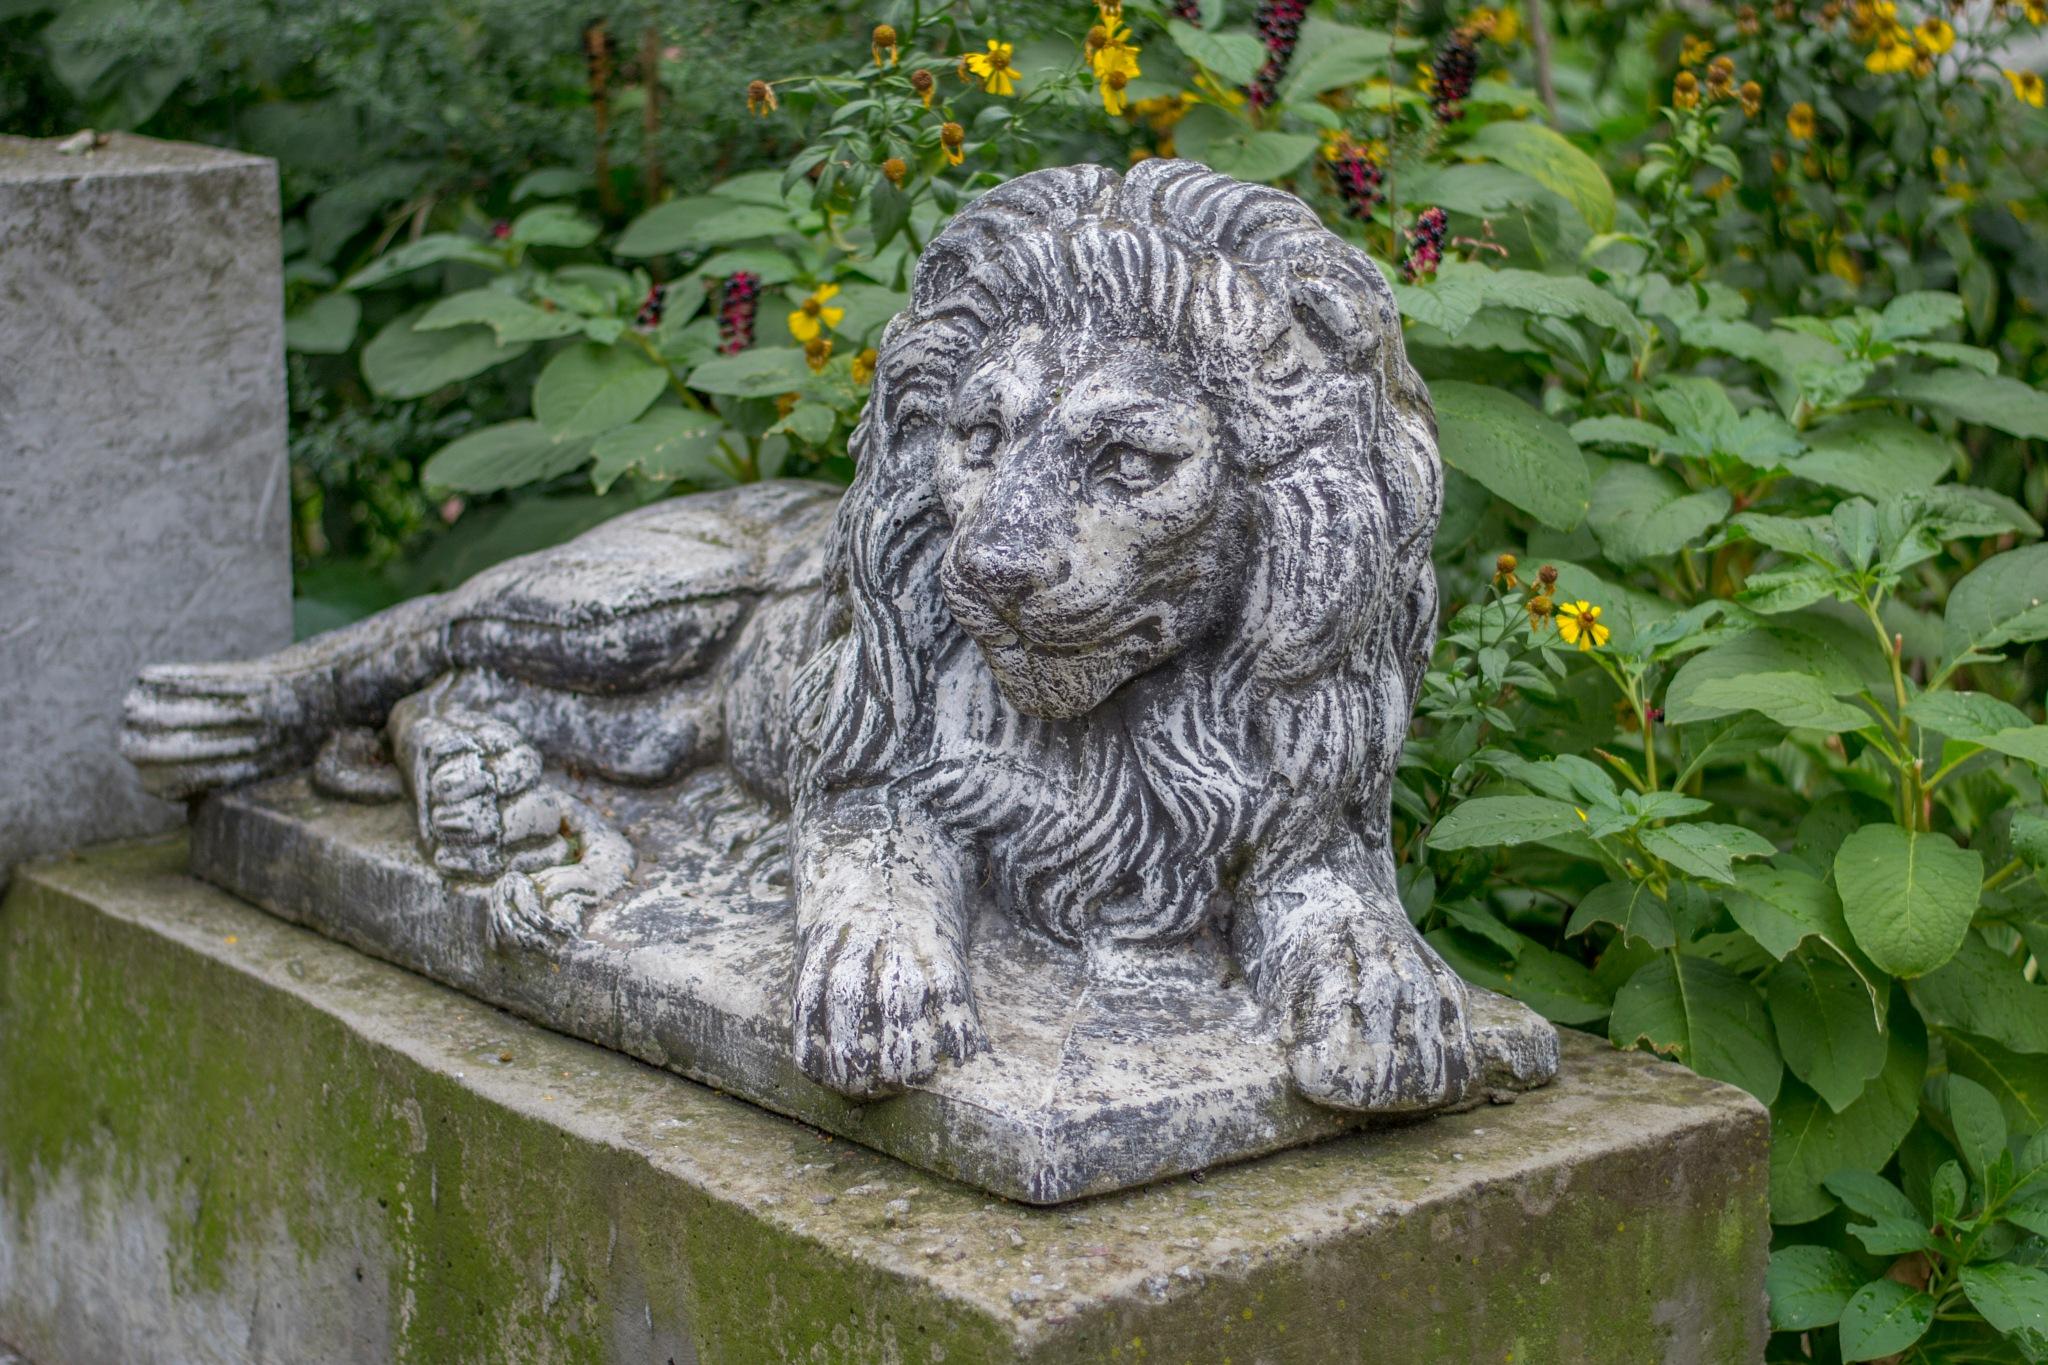 The sculpture of a lion - a symbol of Lviv by Roman Borshovskyy